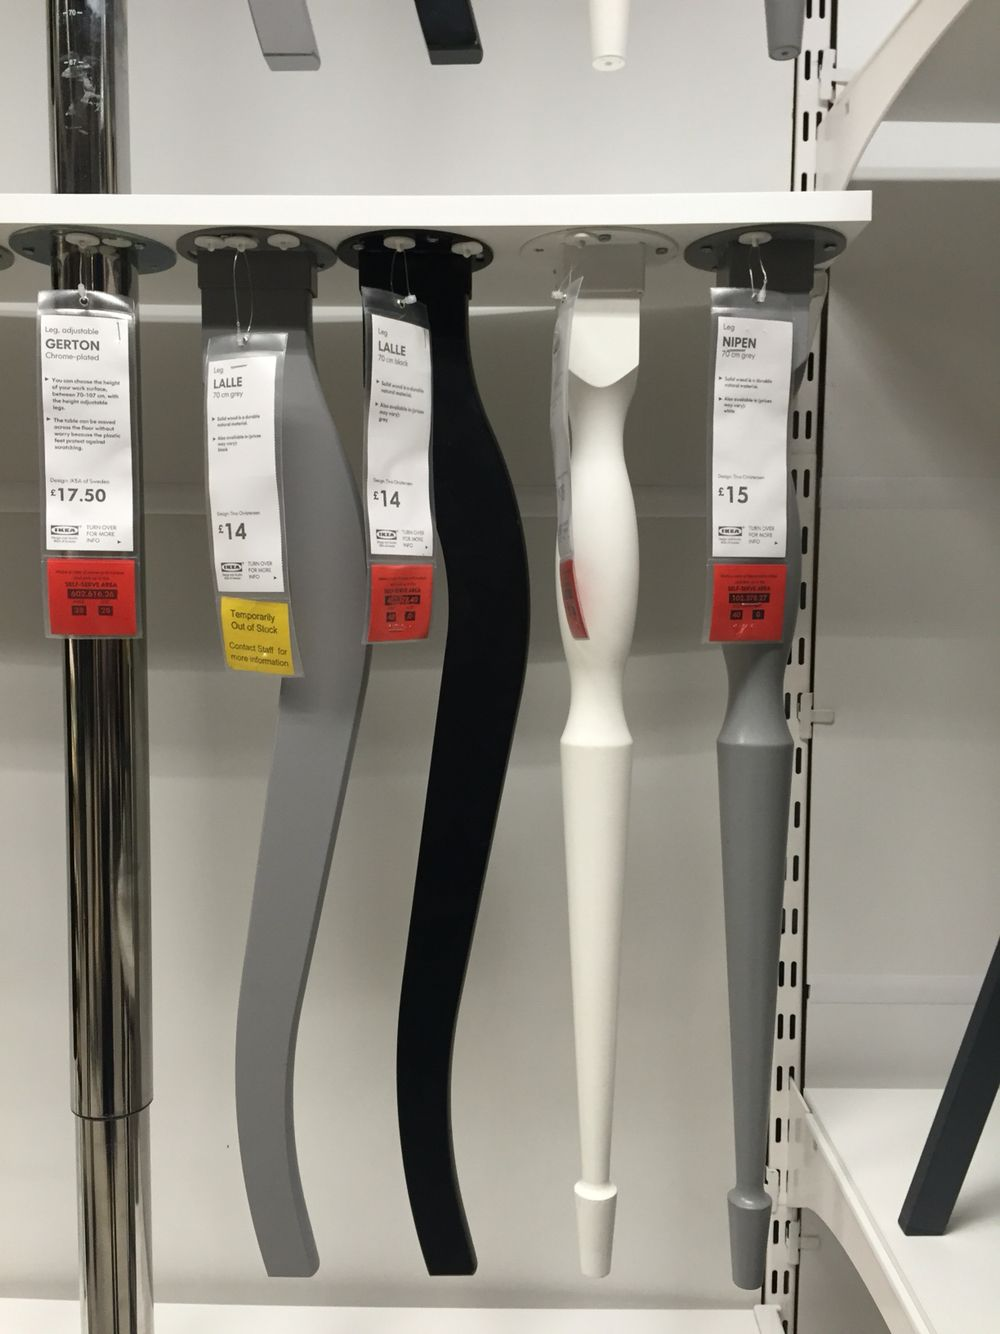 Patas de mesa ikea patas de mesas pinterest - Ikea patas muebles ...